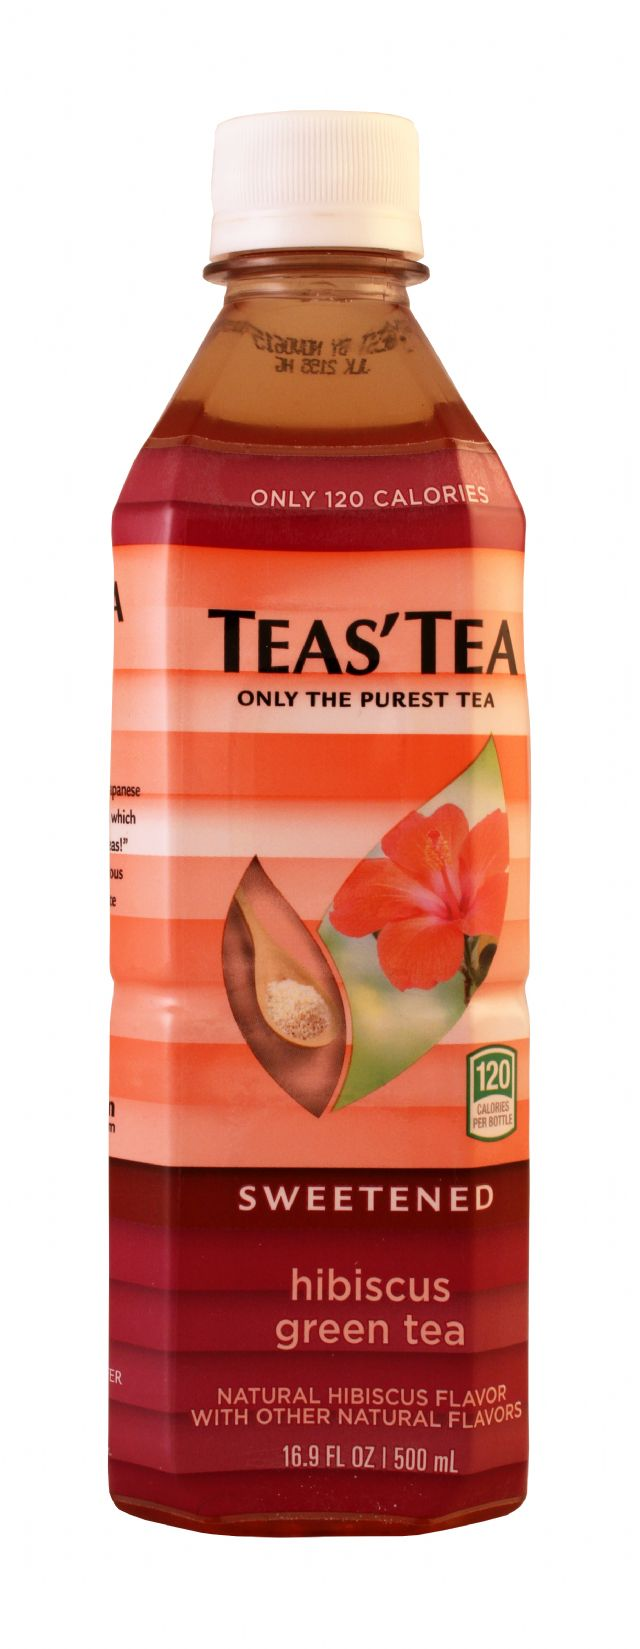 Teas' Tea: TeasTea Hibiscu Front